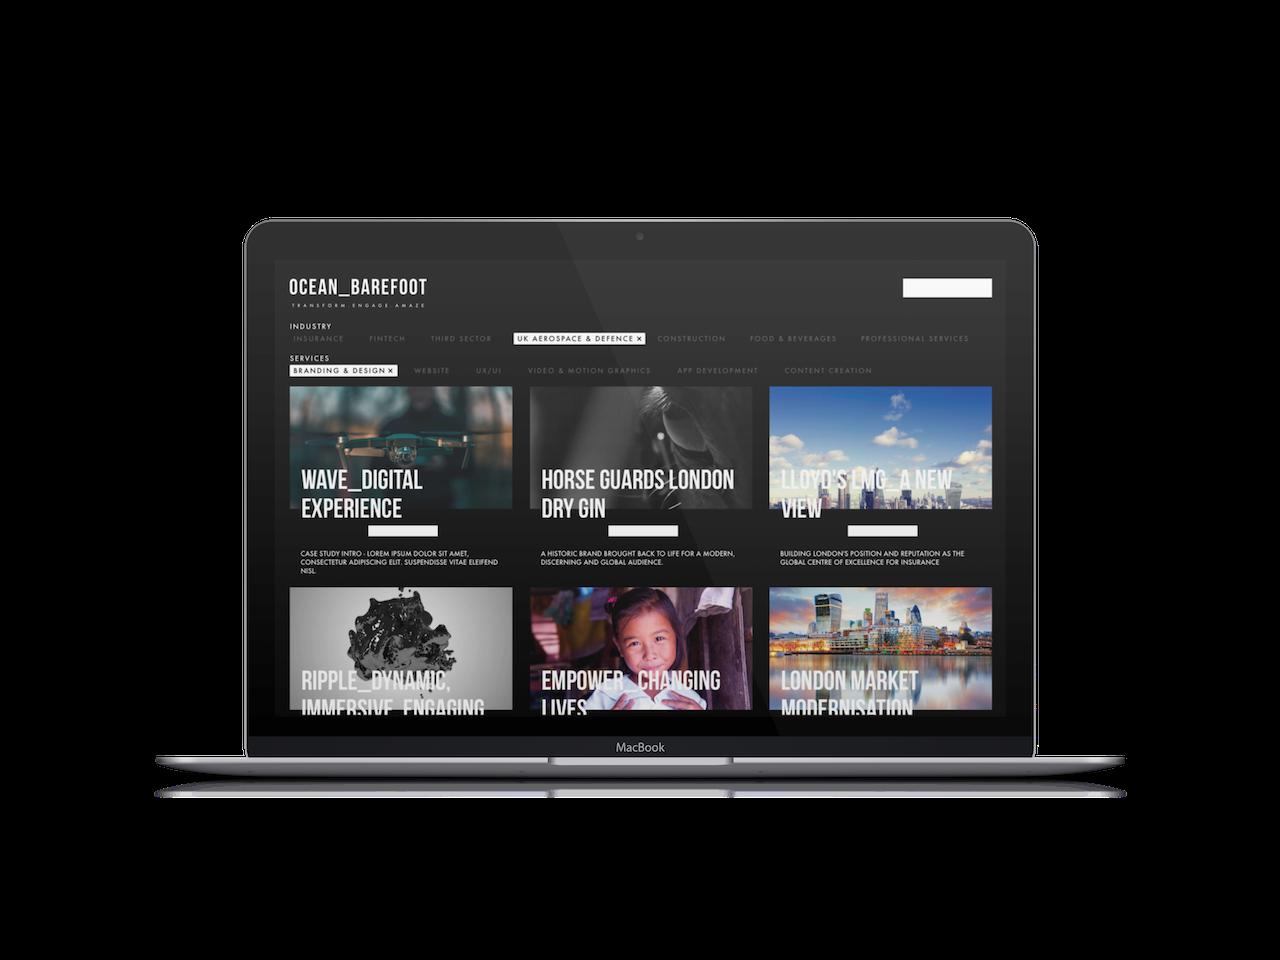 OB_laptop-mockup-of-a-macbook-air-over-transparent-background